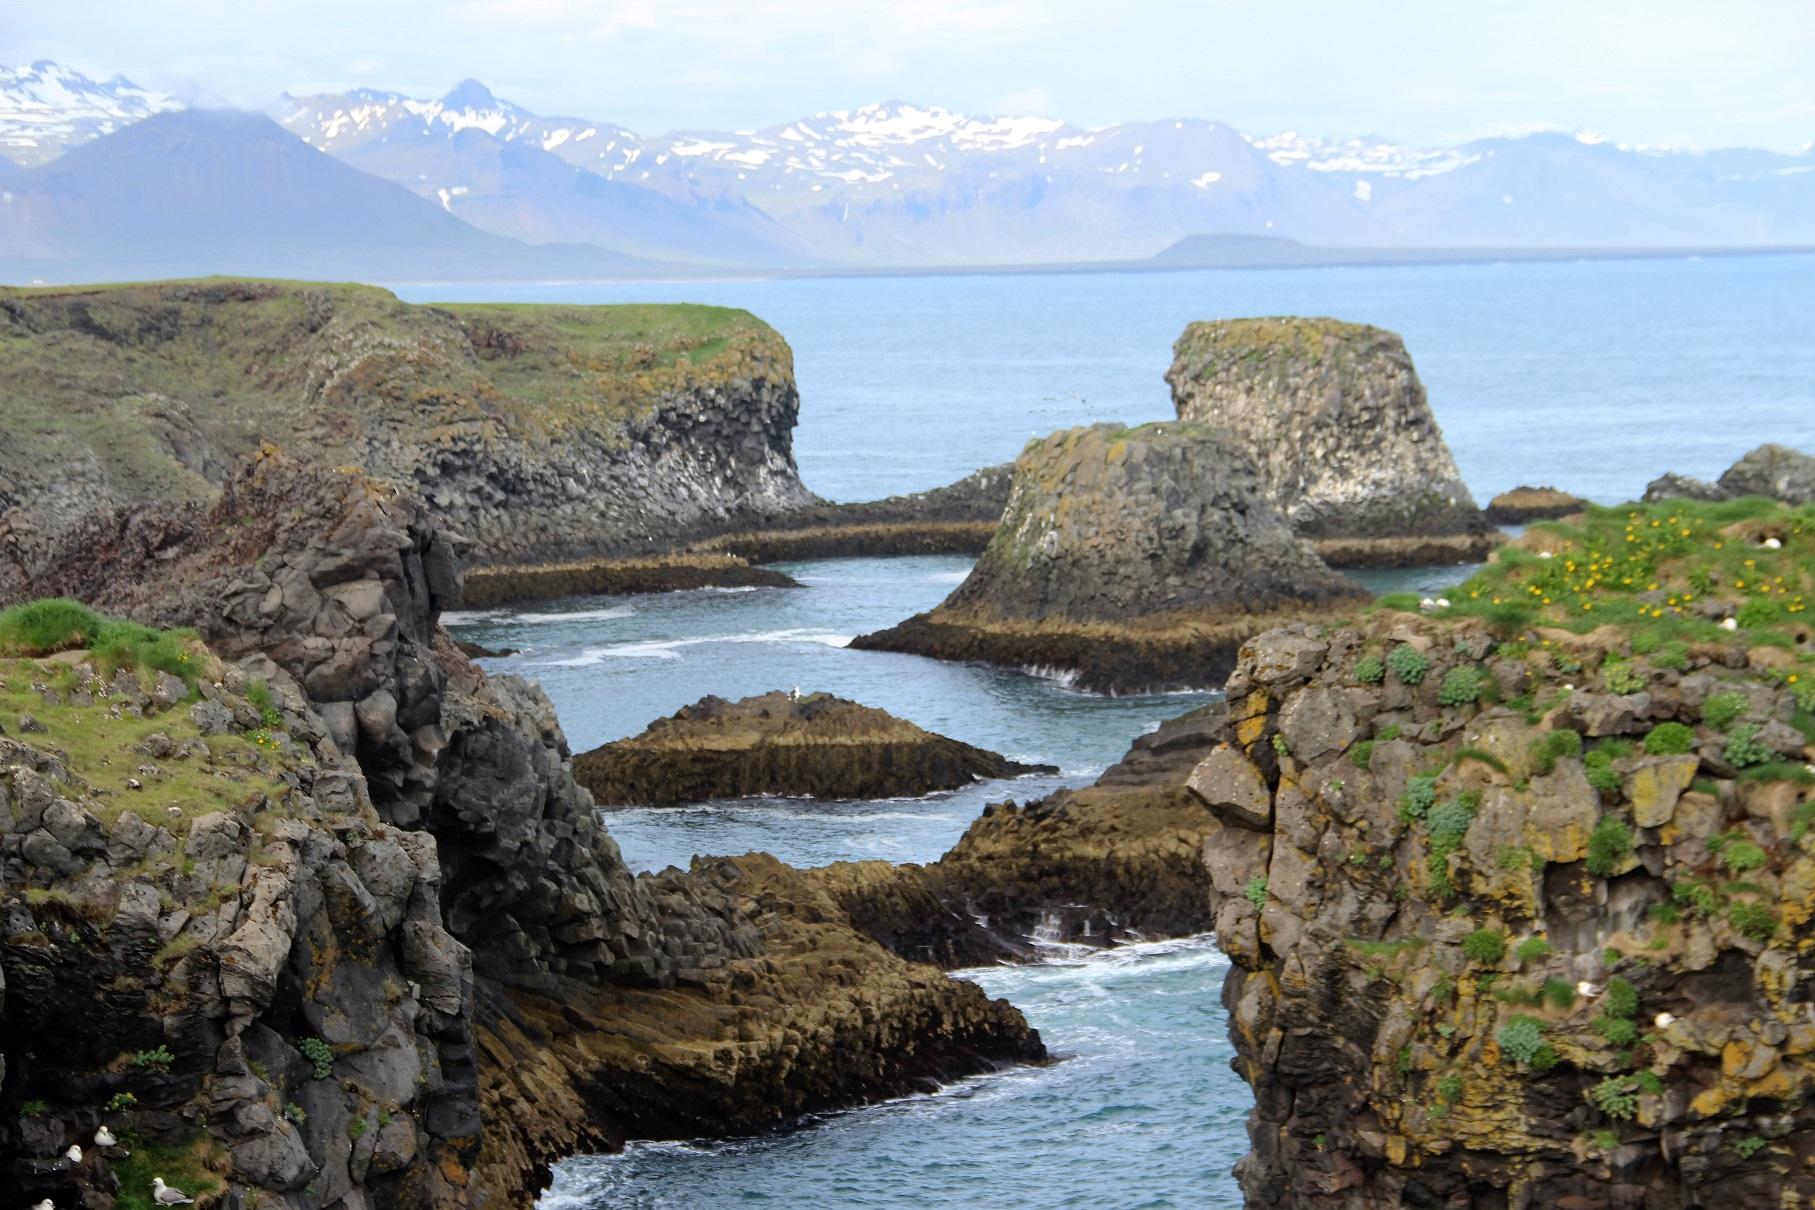 La boucle de la péninsule de Snæfellsnes